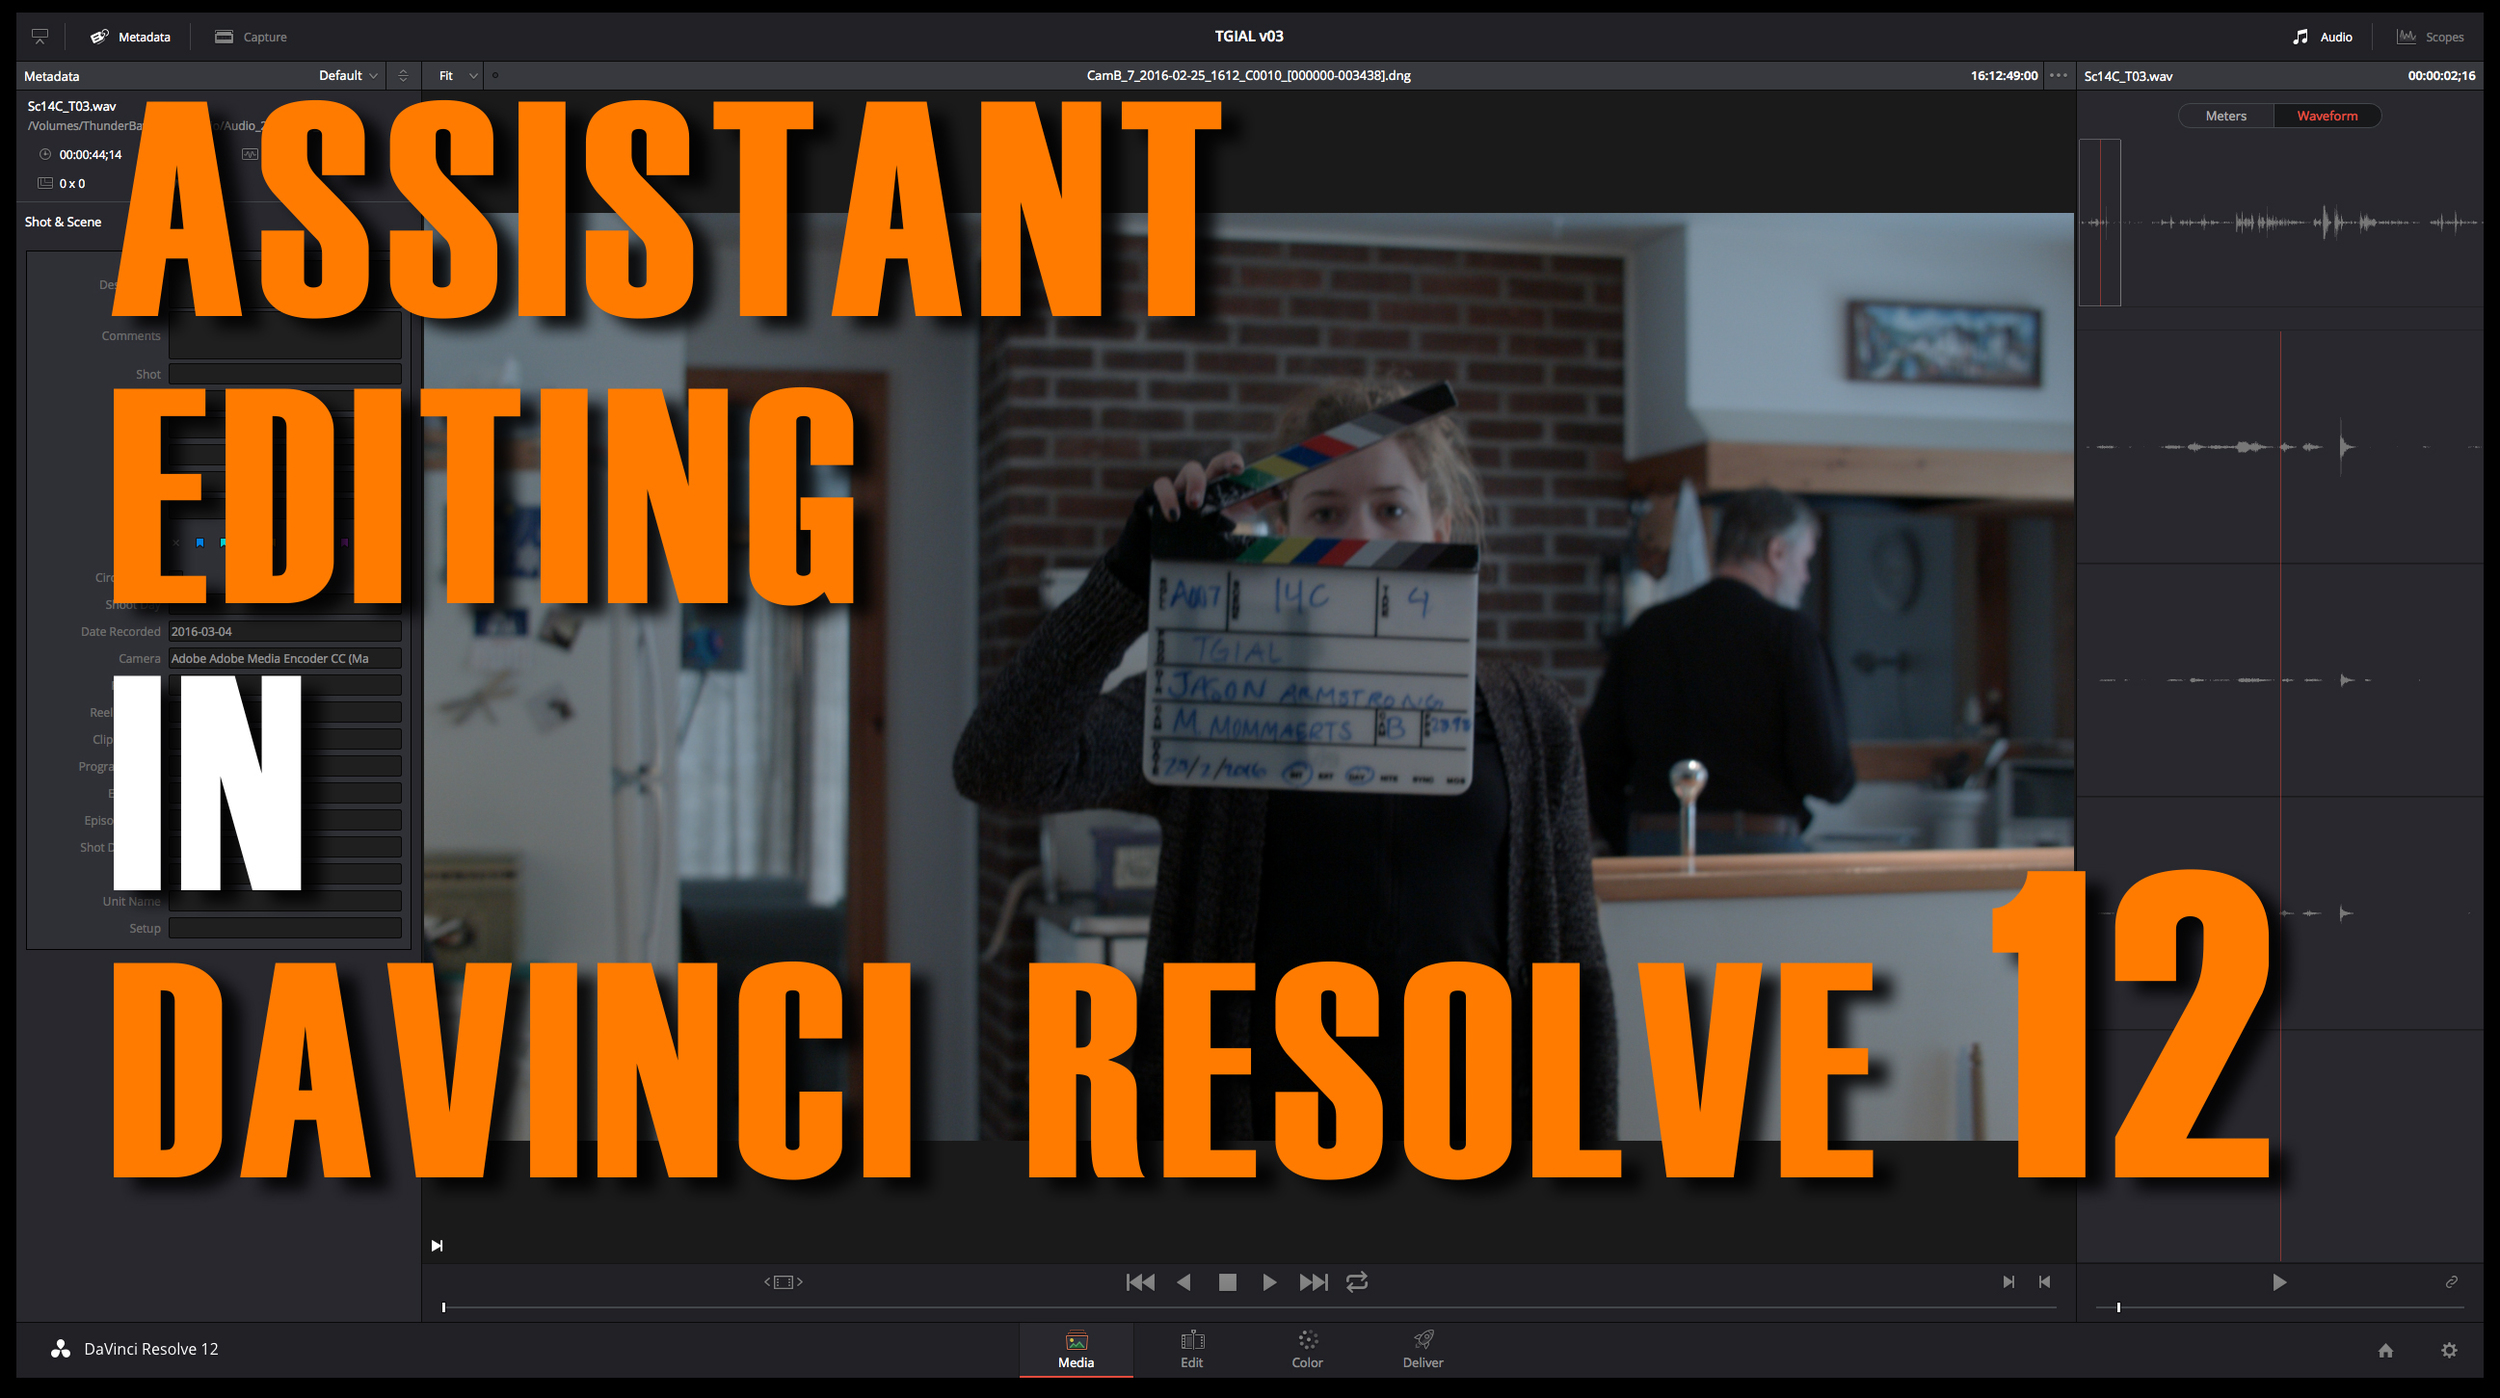 assistant editing in davinci resolve 12